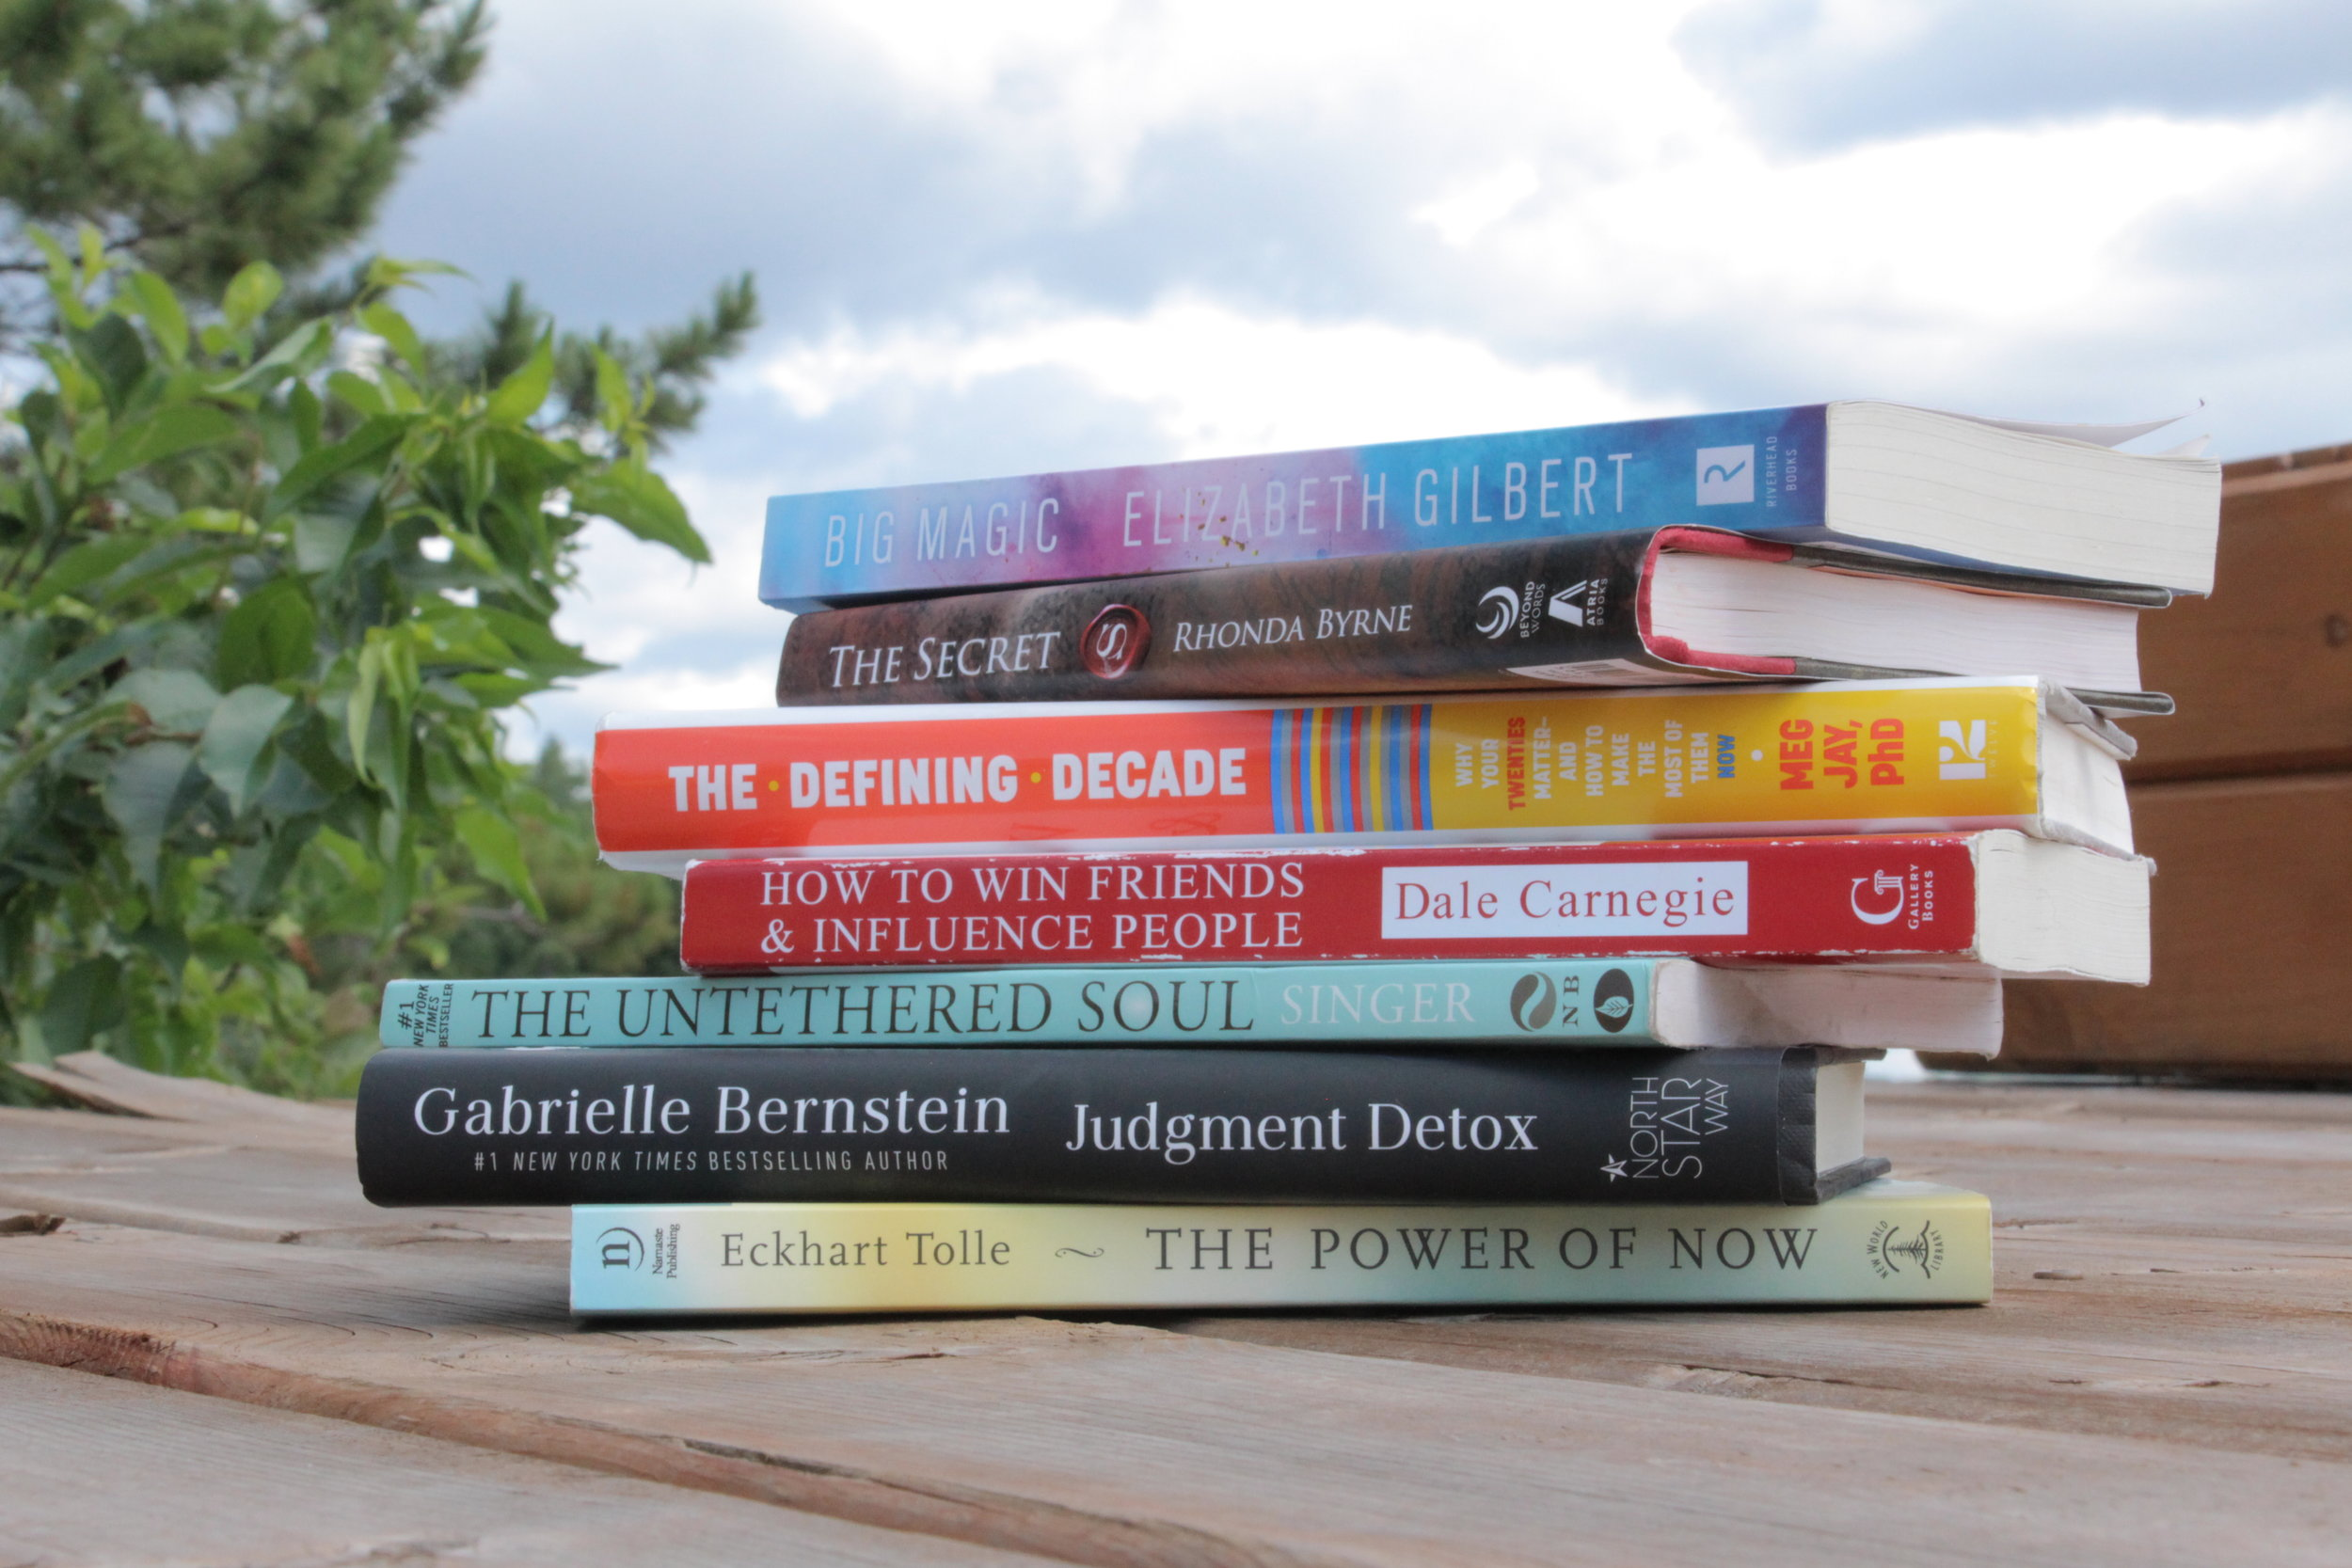 Sam D Squire | Self-Development | Books Reading